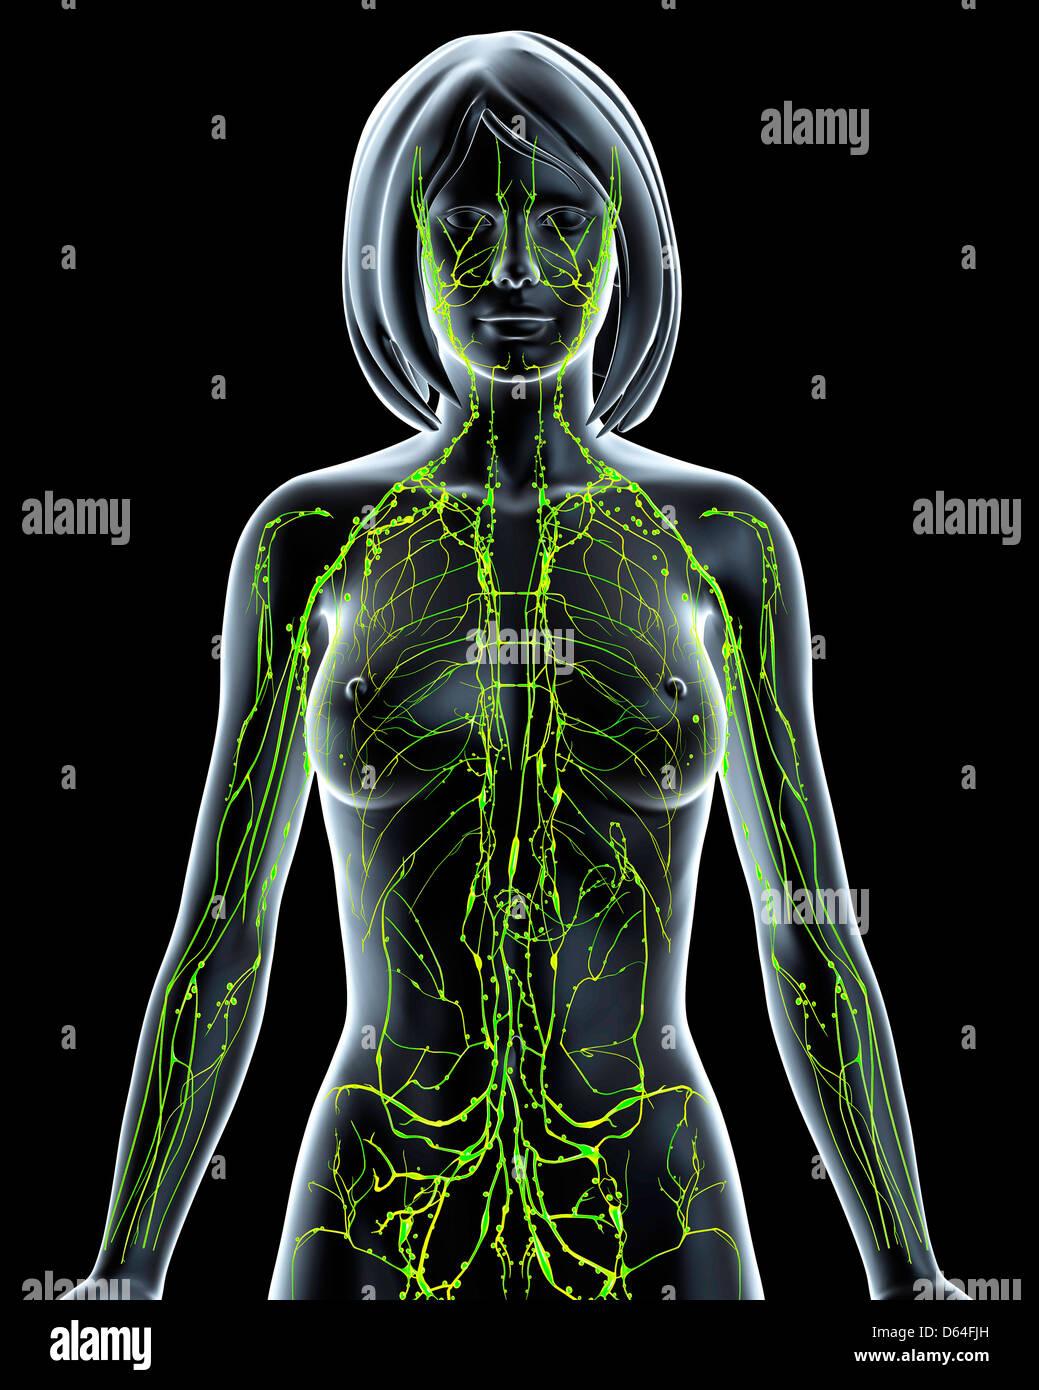 Female Lymphatic System Stock Photos Female Lymphatic System Stock